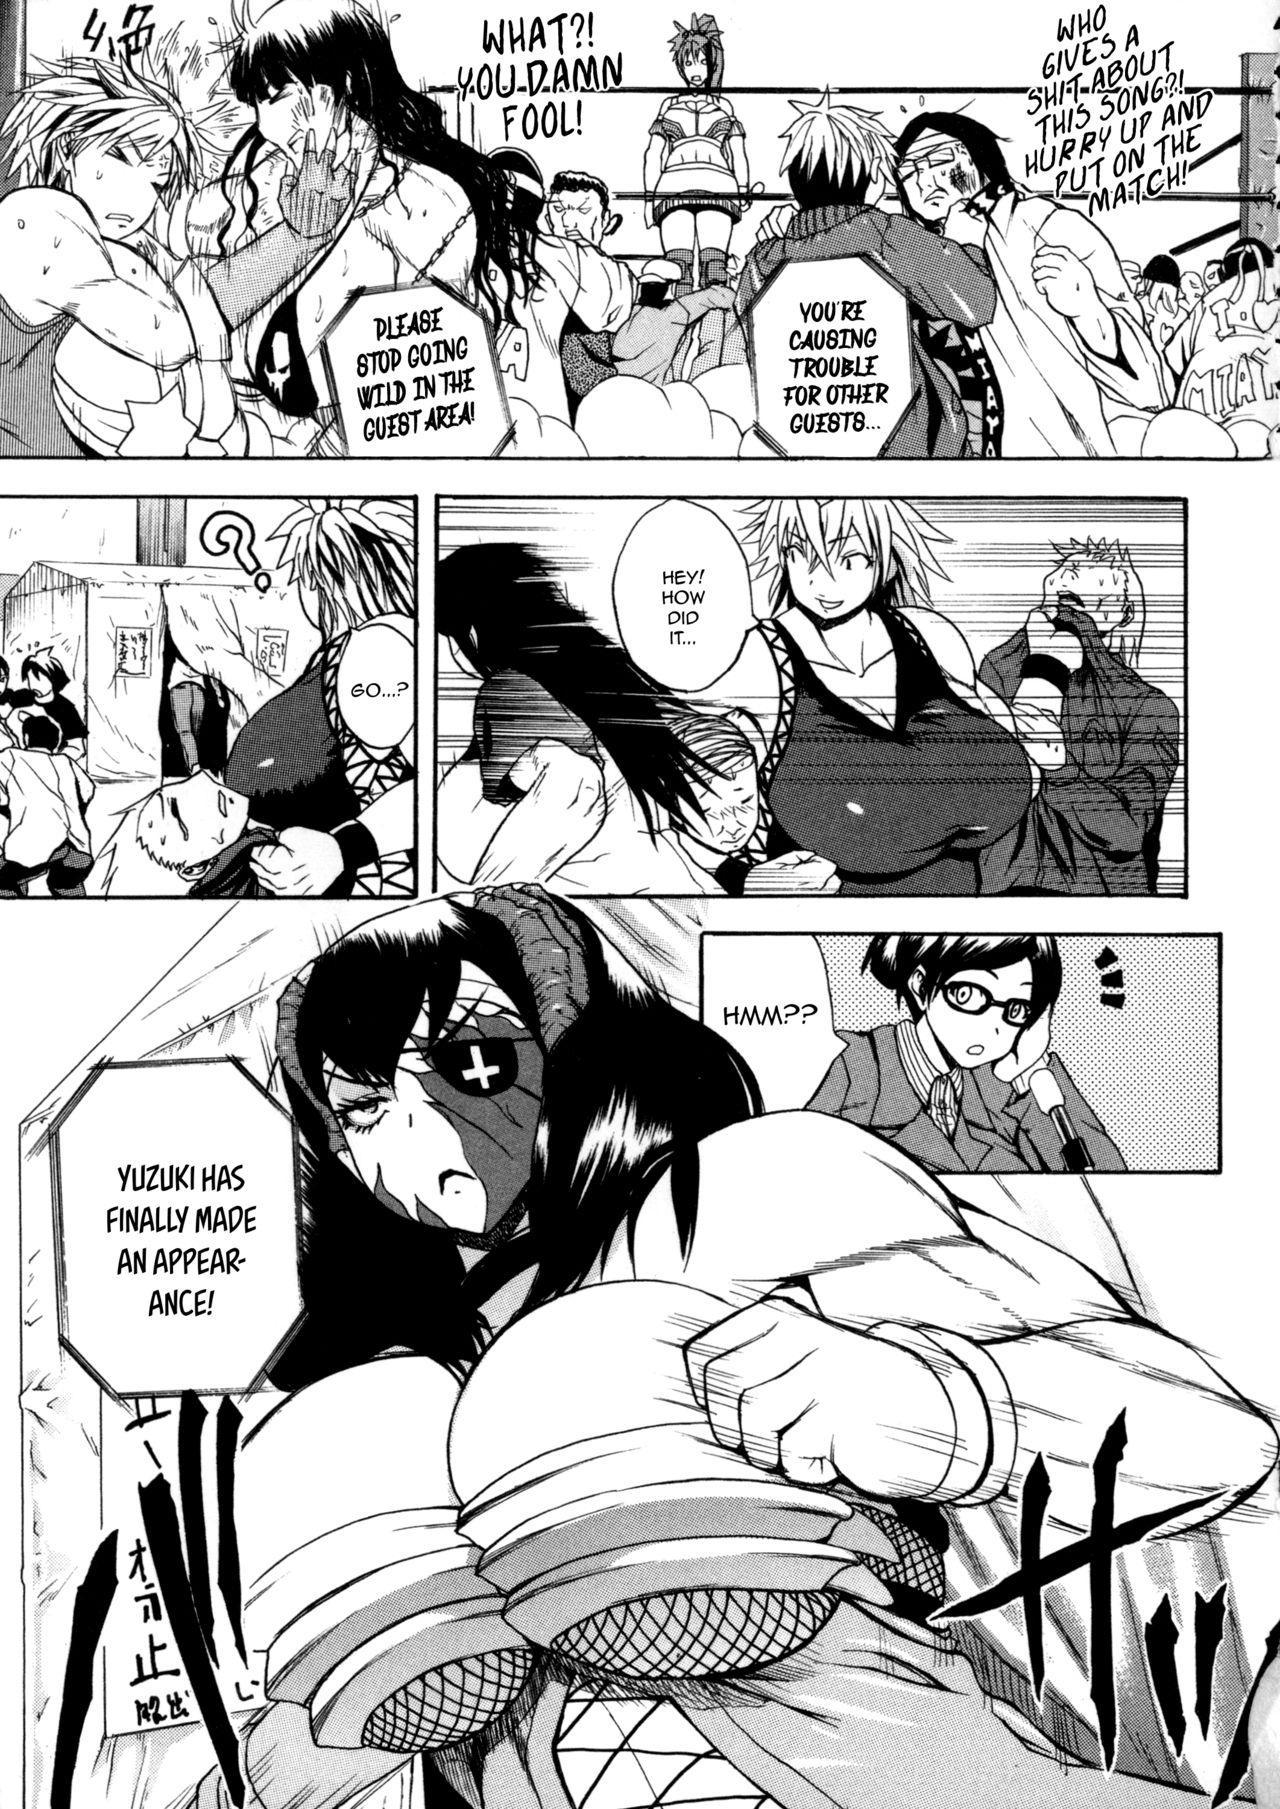 [Yoshimura Tatsumaki] Monzetsu Taigatame ~Count 3 de Ikasete Ageru~ | Faint in Agony Bodylock ~I'll make you cum on the count of 3~ [English] [Brolen] 155